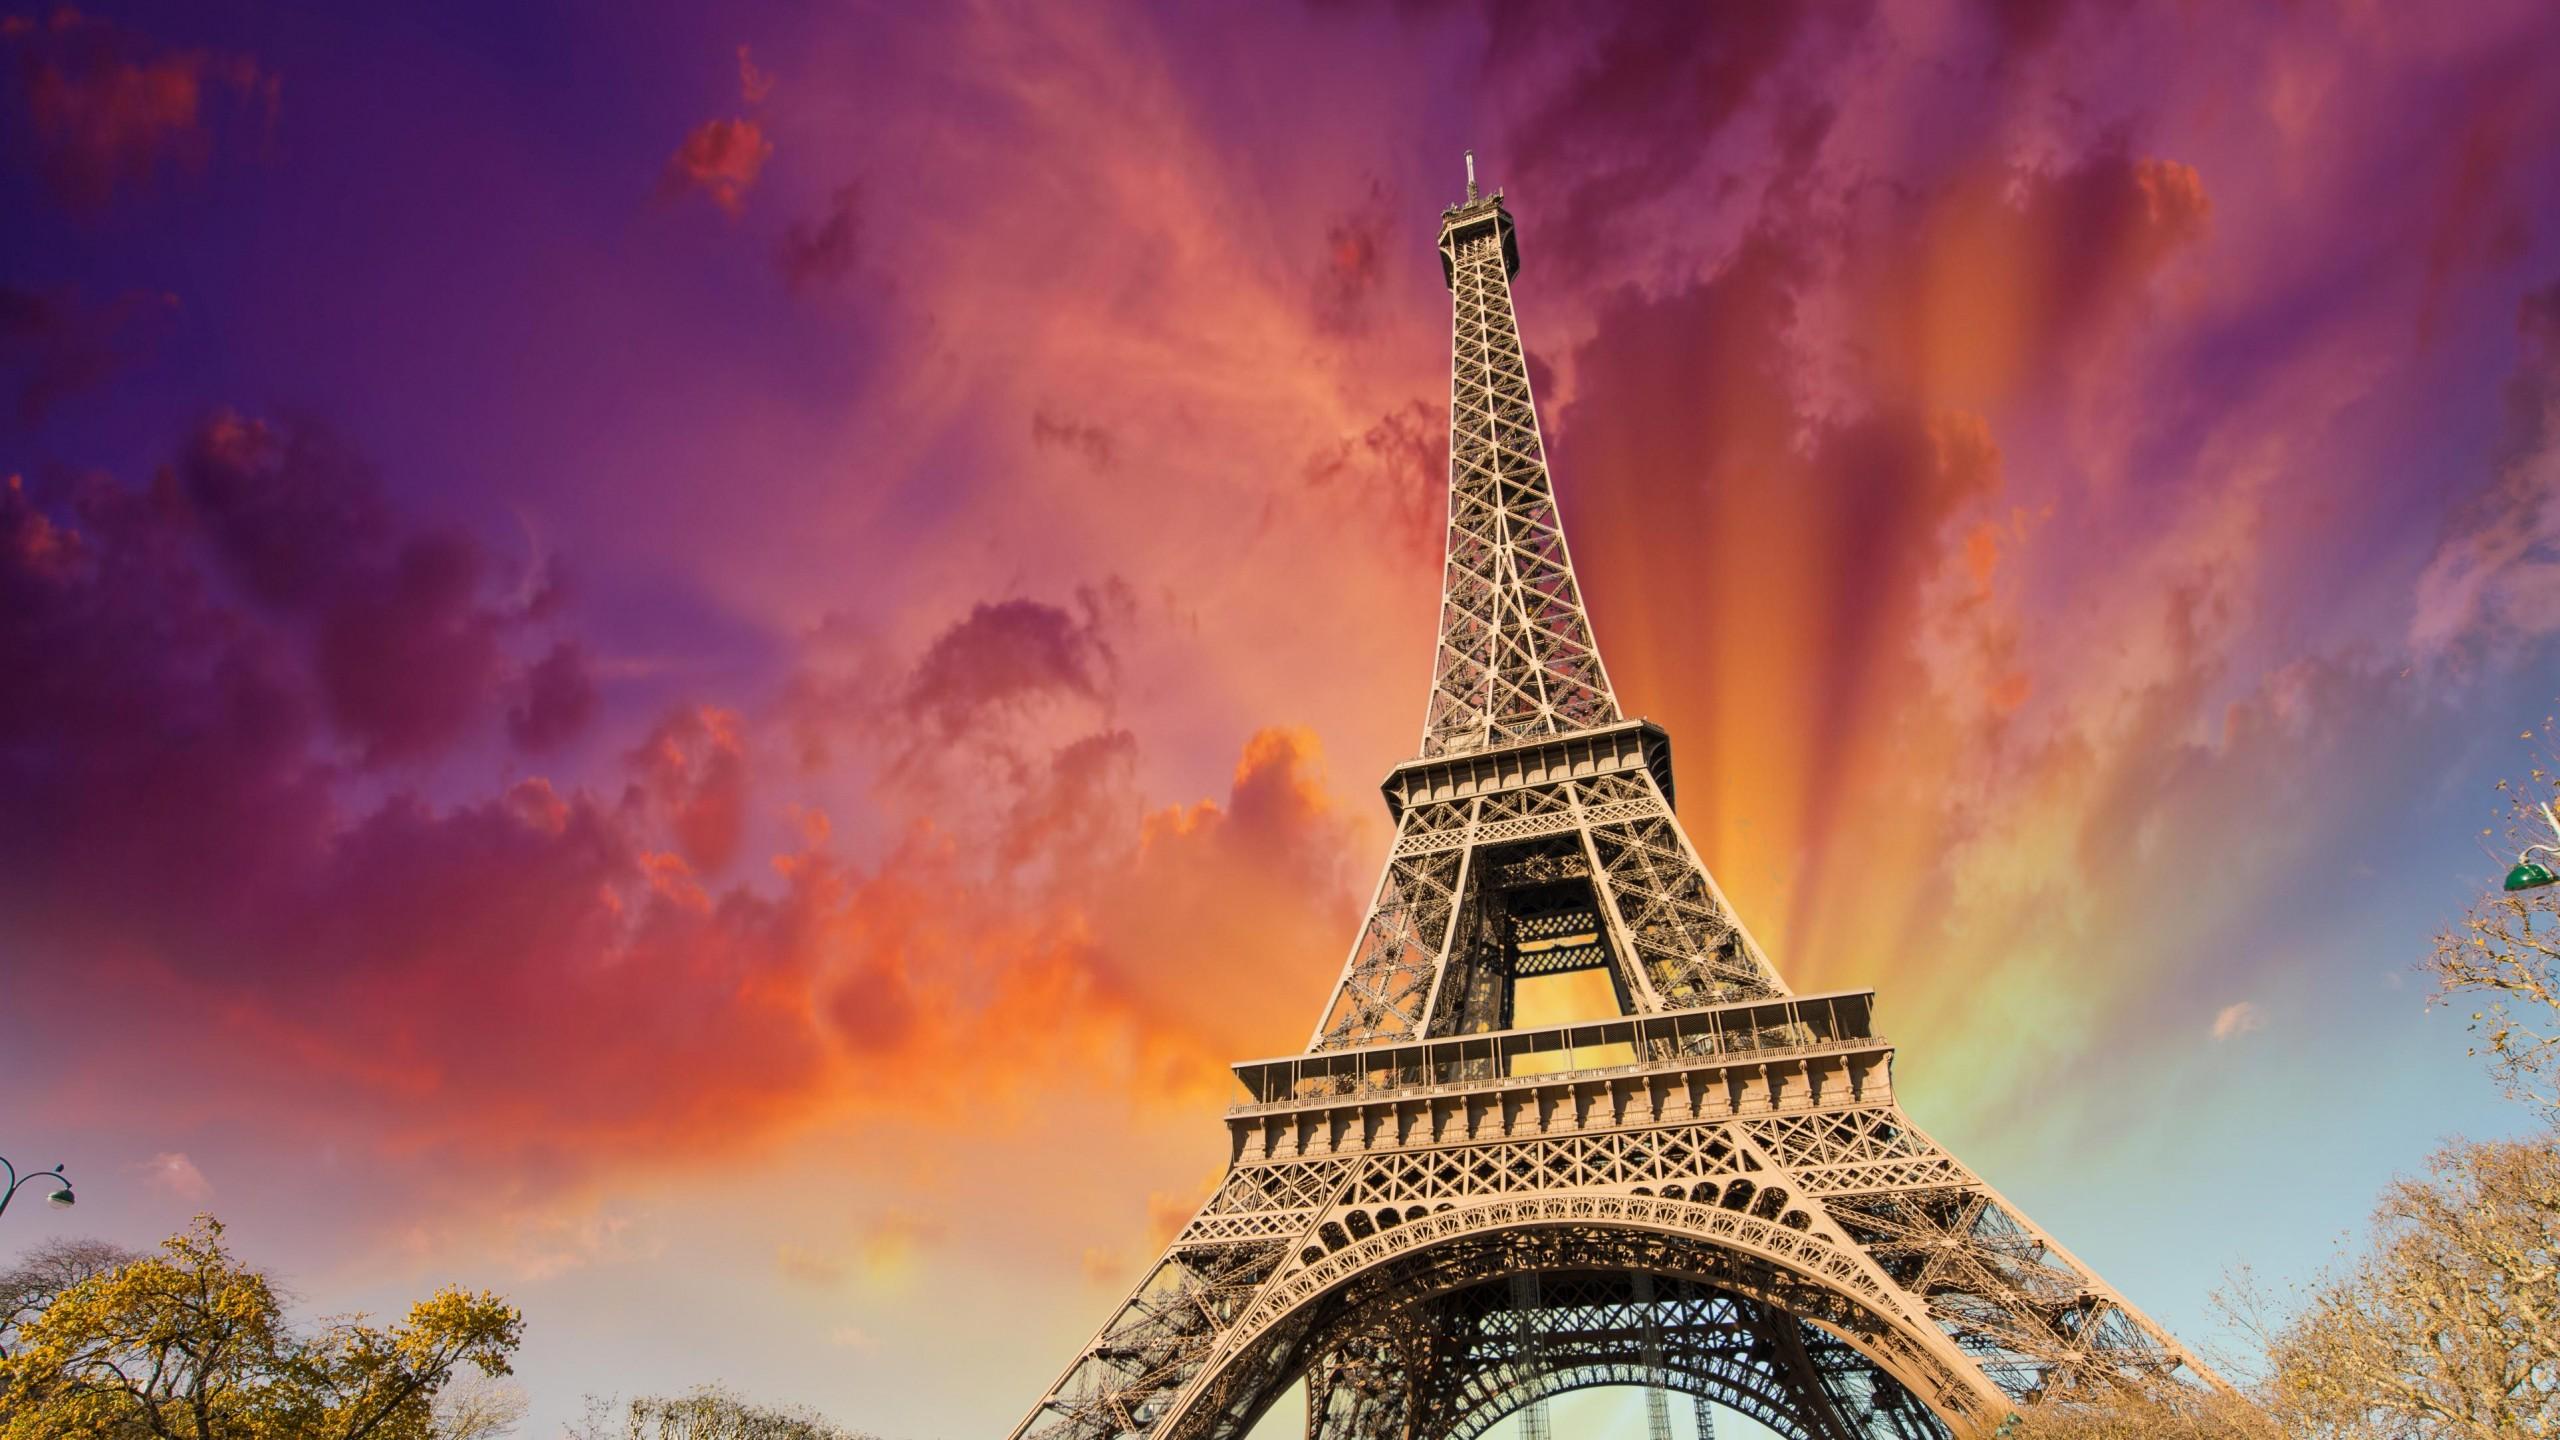 Girls Wallpapers Effle Tower Wallpaper Eiffel Tower Paris France Tourism Travel